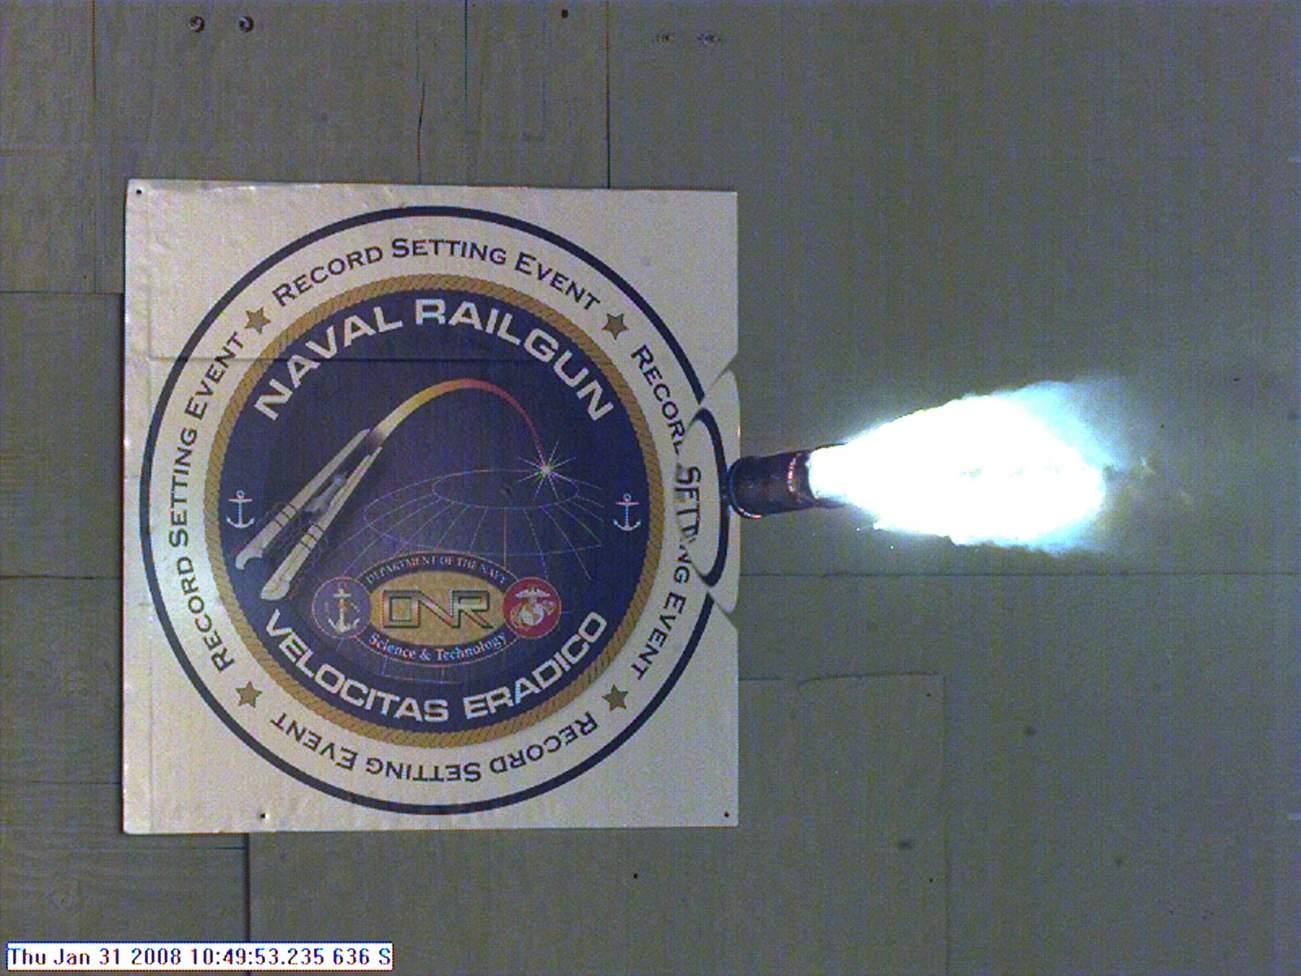 Not Even a Mountain Can Stop the U.S. Navy's New Experimental Railgun